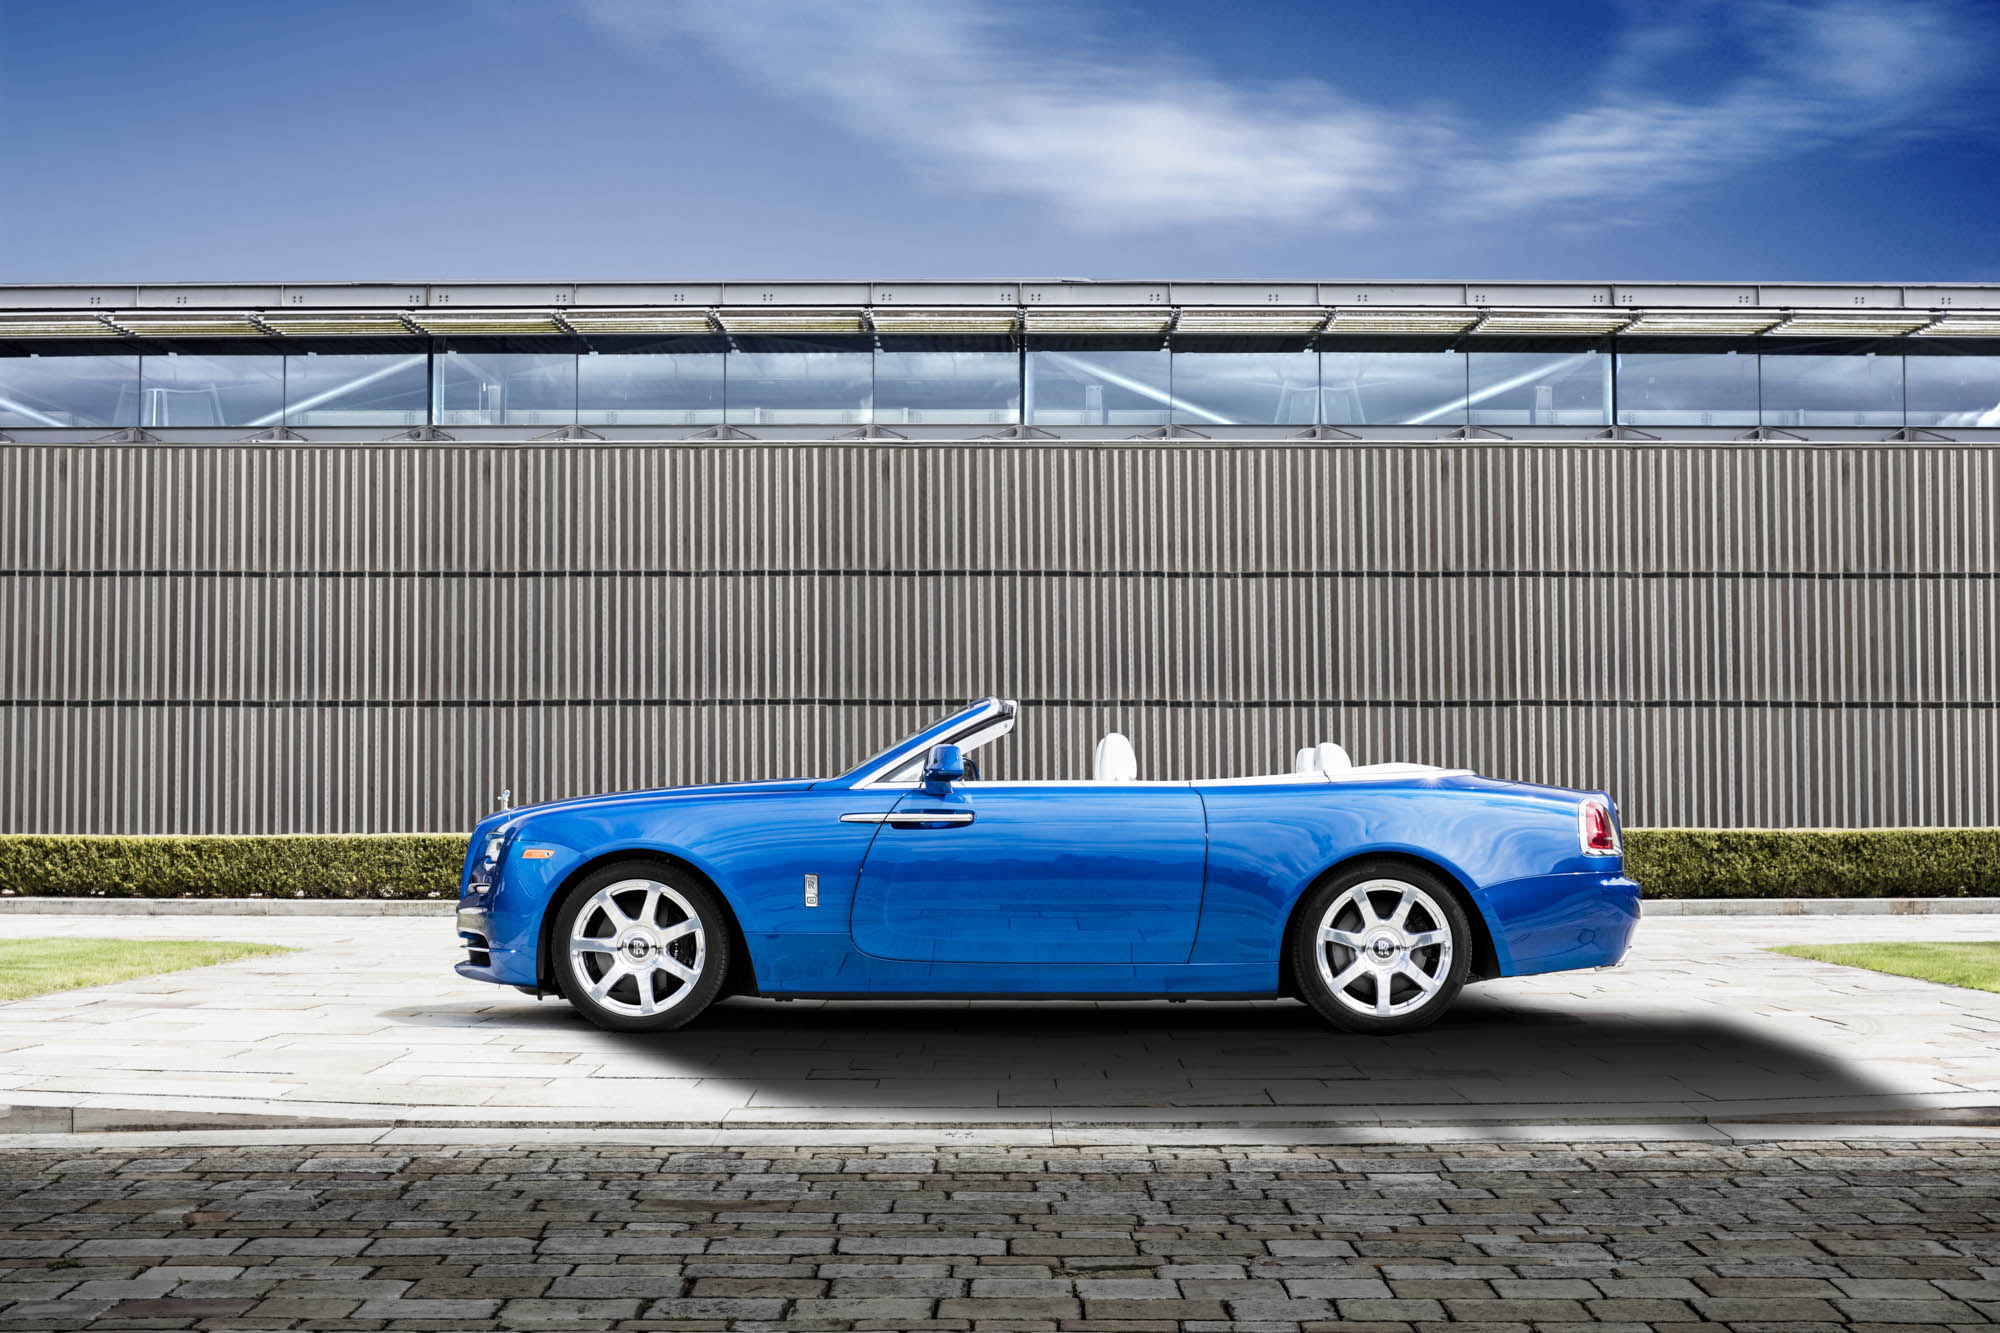 The Michael 'Fux Blue' Rolls-Royce Pebble Beach Dawn